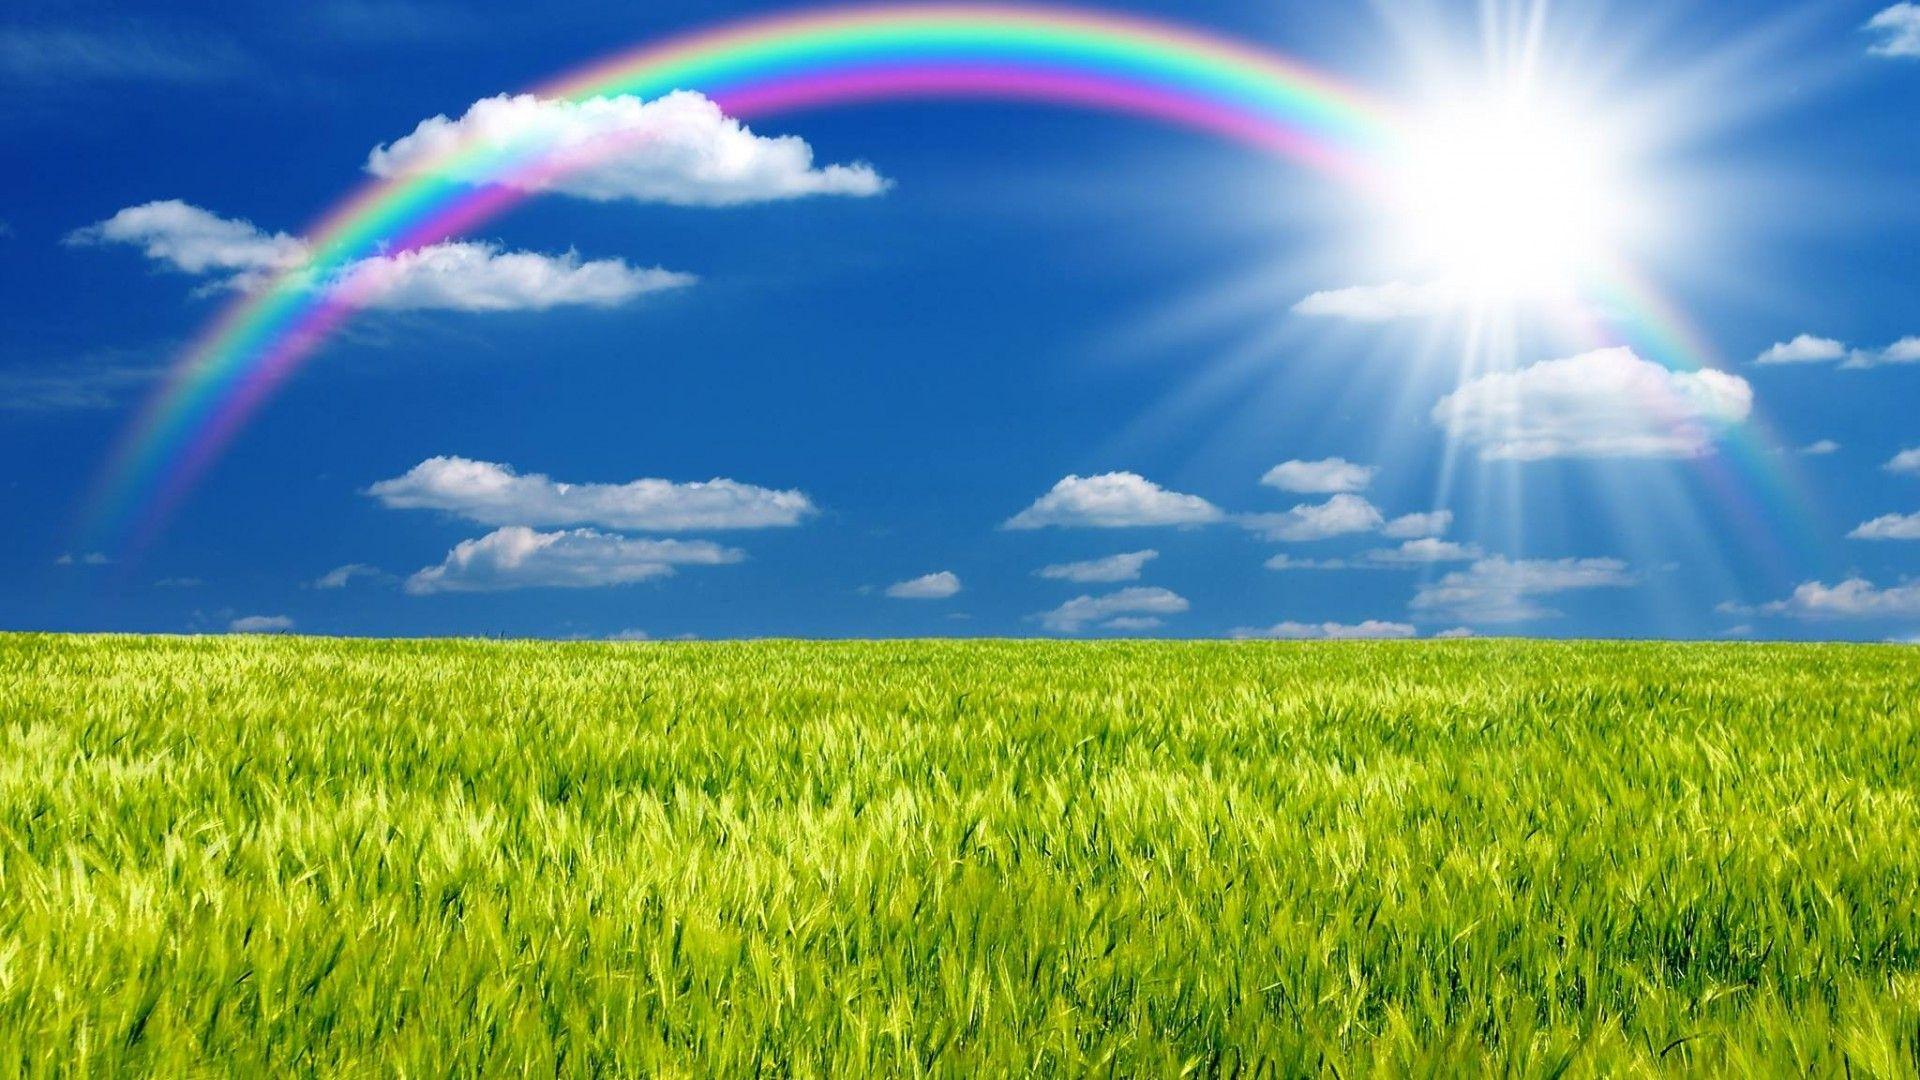 rainbows-rainbow-blue-green-grass-sky-sun-clouds-images-1920x1080.jpg (1920×1080)